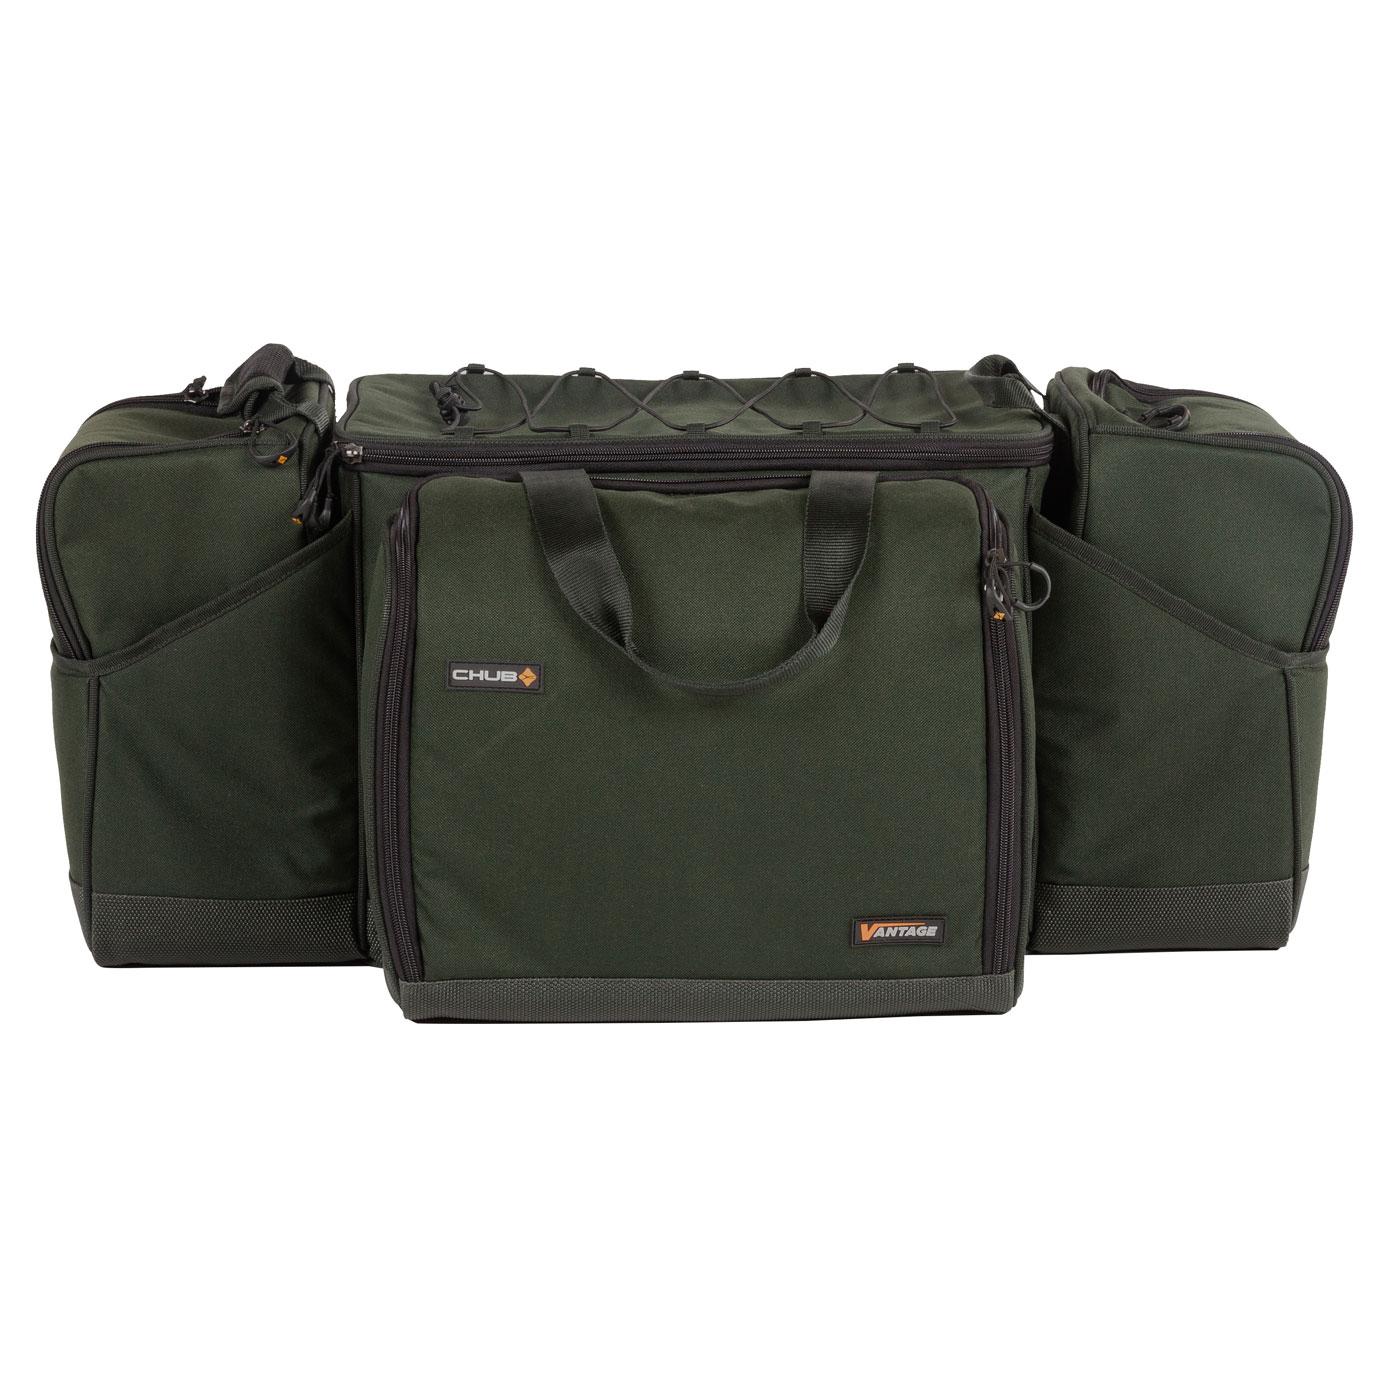 Chub Vantage Long Session Food Bags